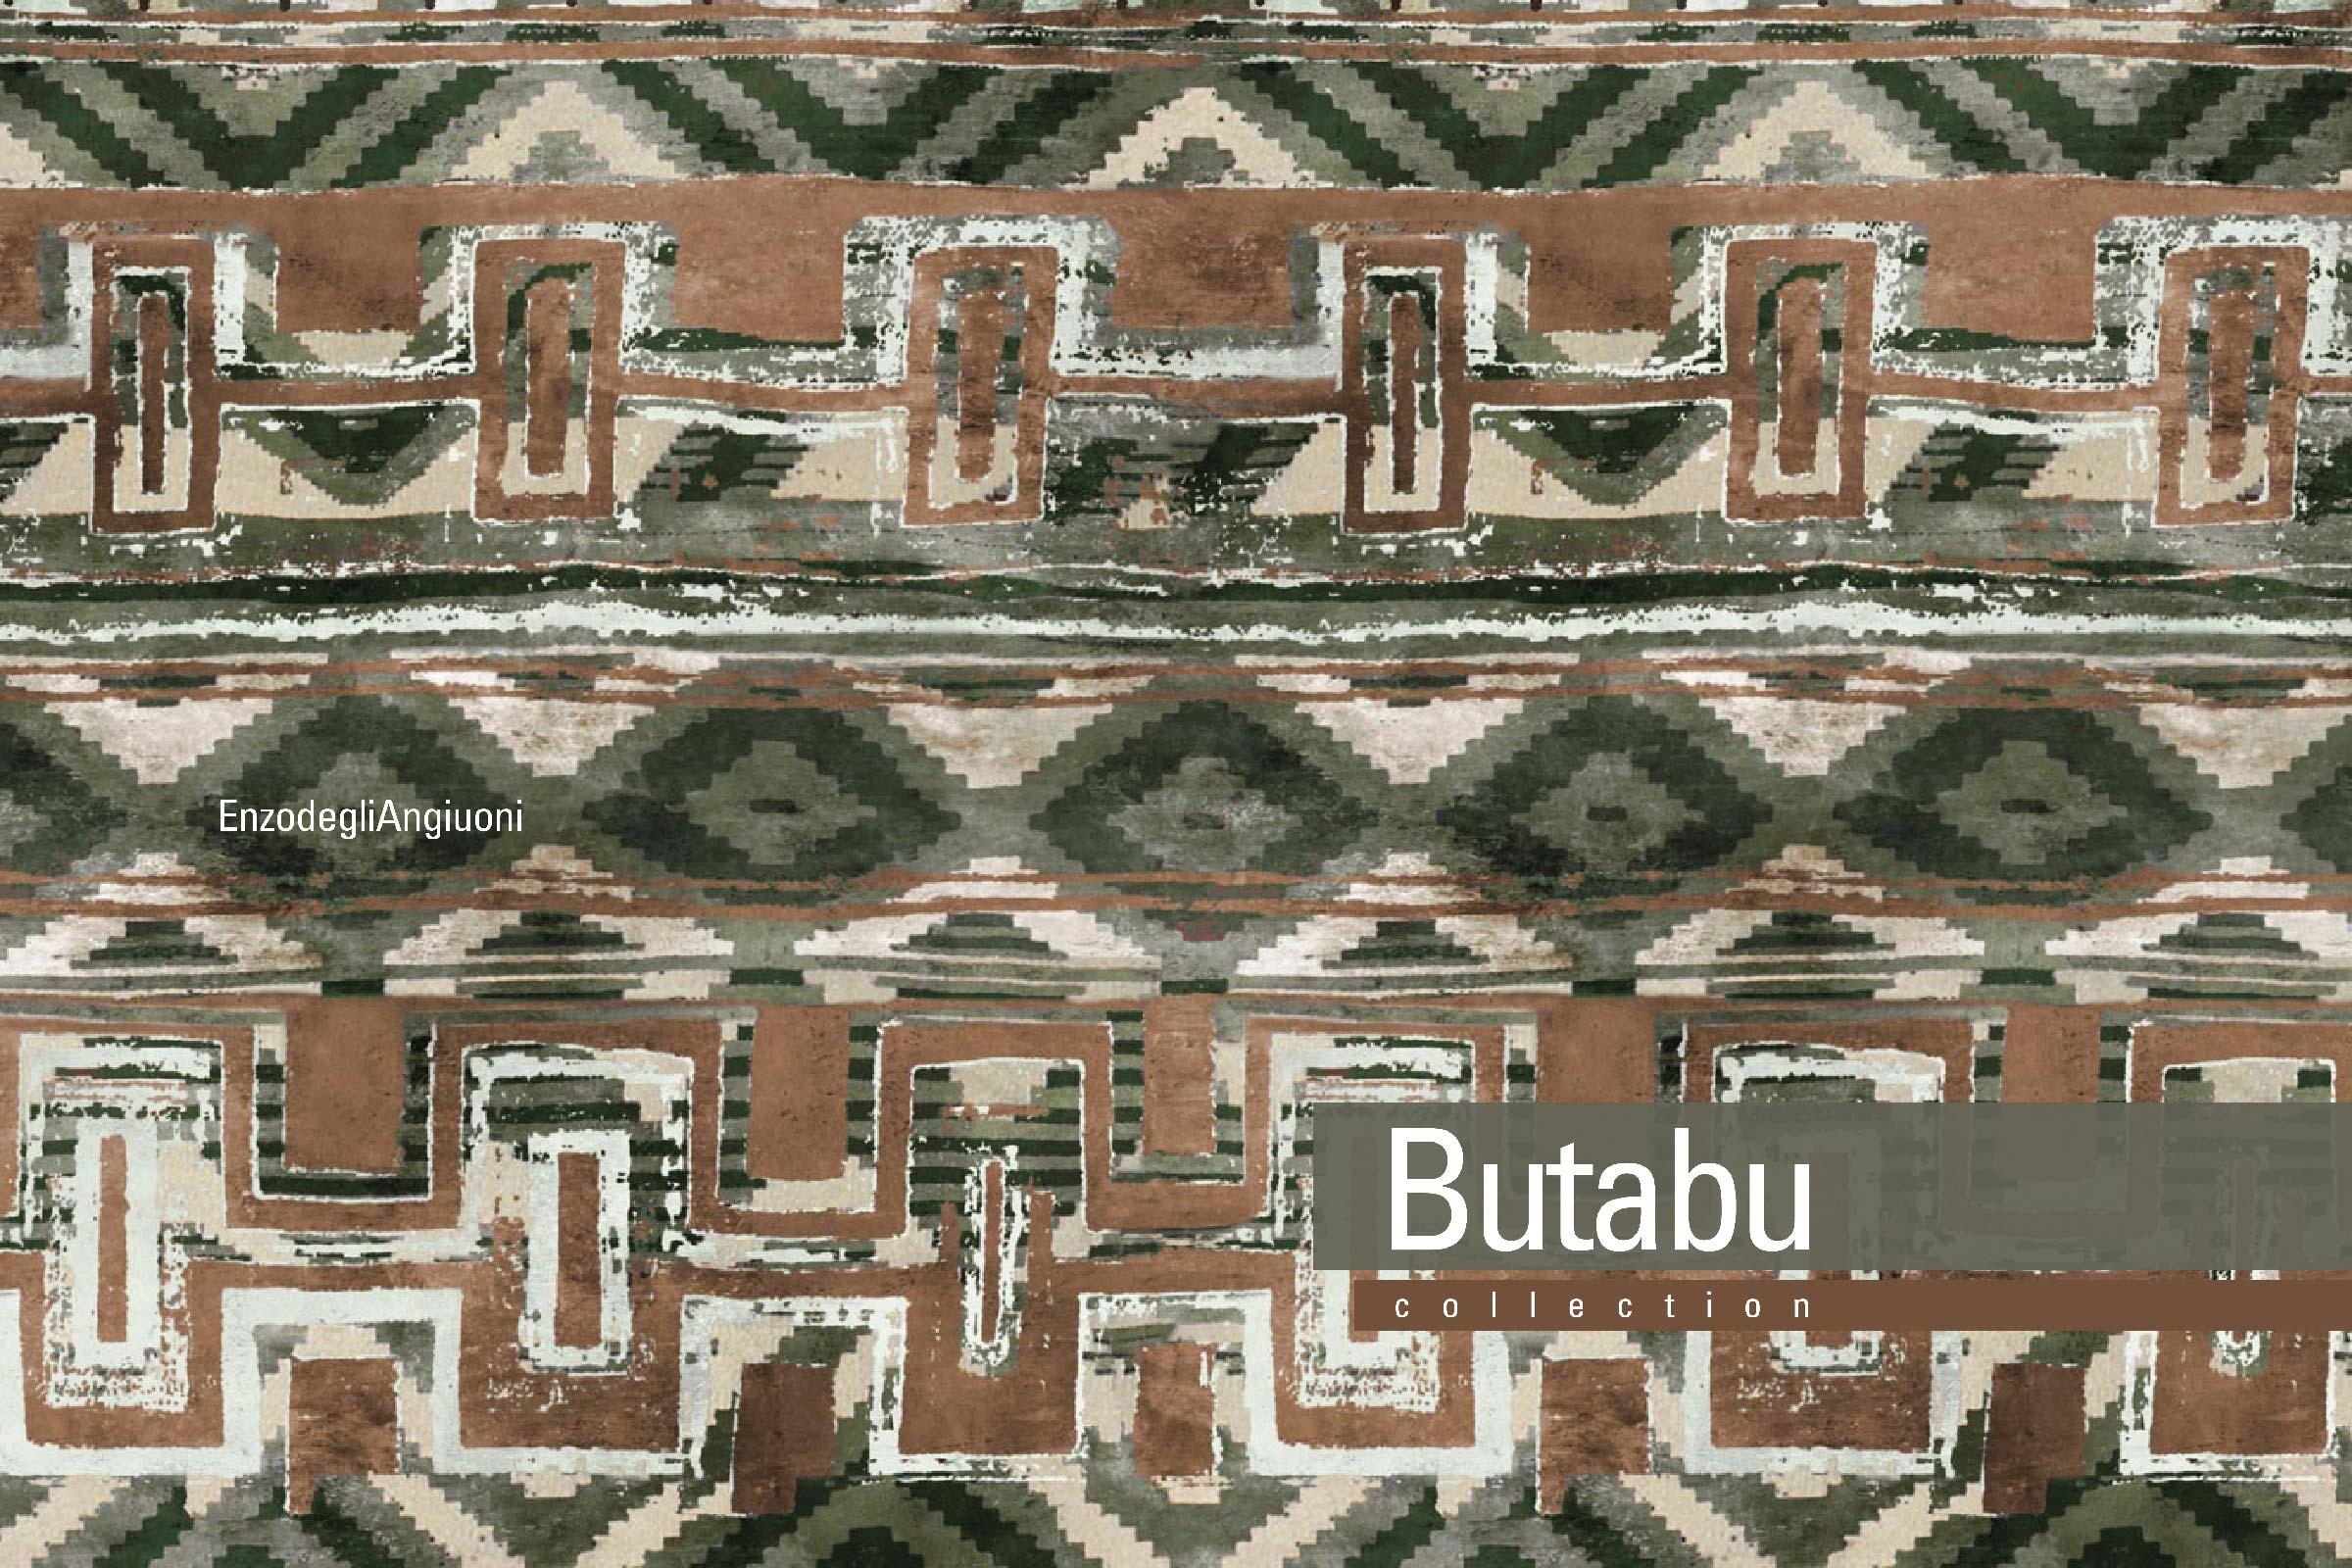 enzodegliangiuoni-Butabu-2019